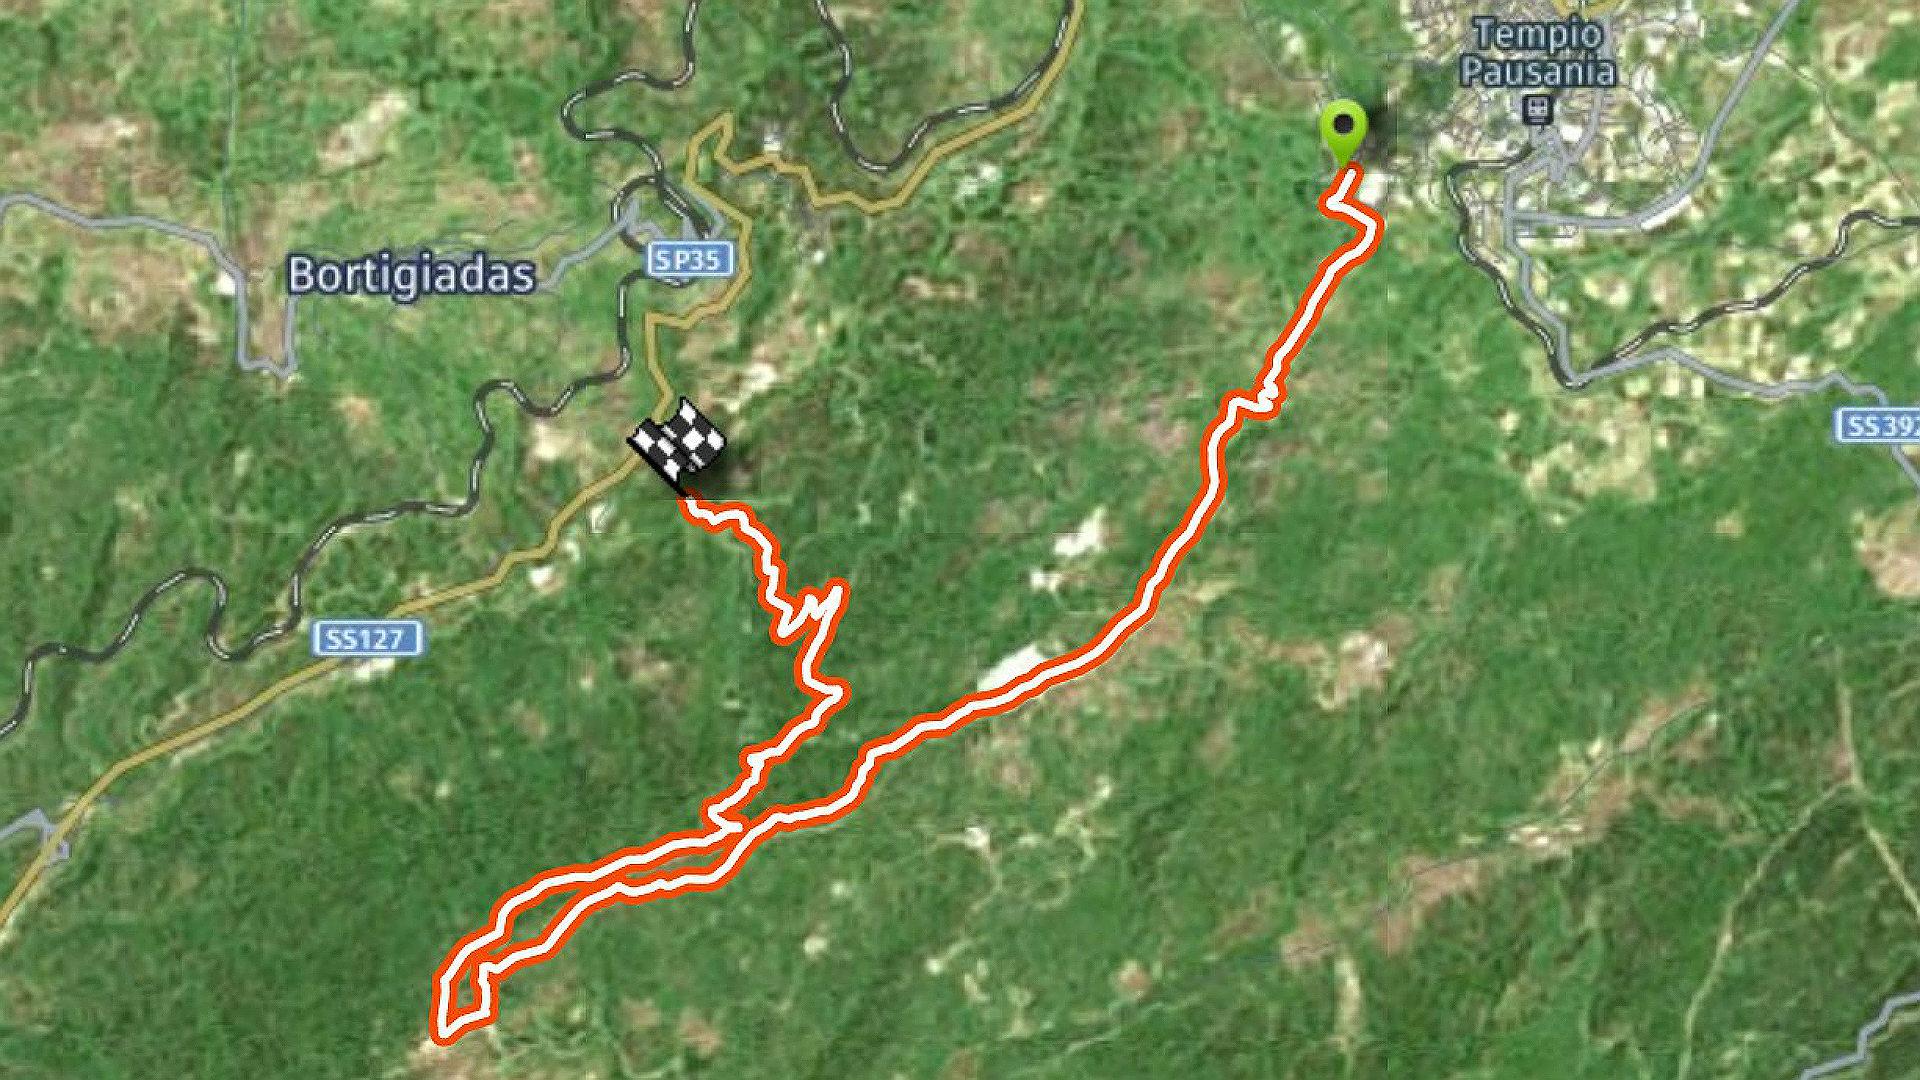 WRC: Rally d' Italia - Sardegna [8-10 Octubre] - Página 2 091020_WRC-SS1map-Italy-2020_001